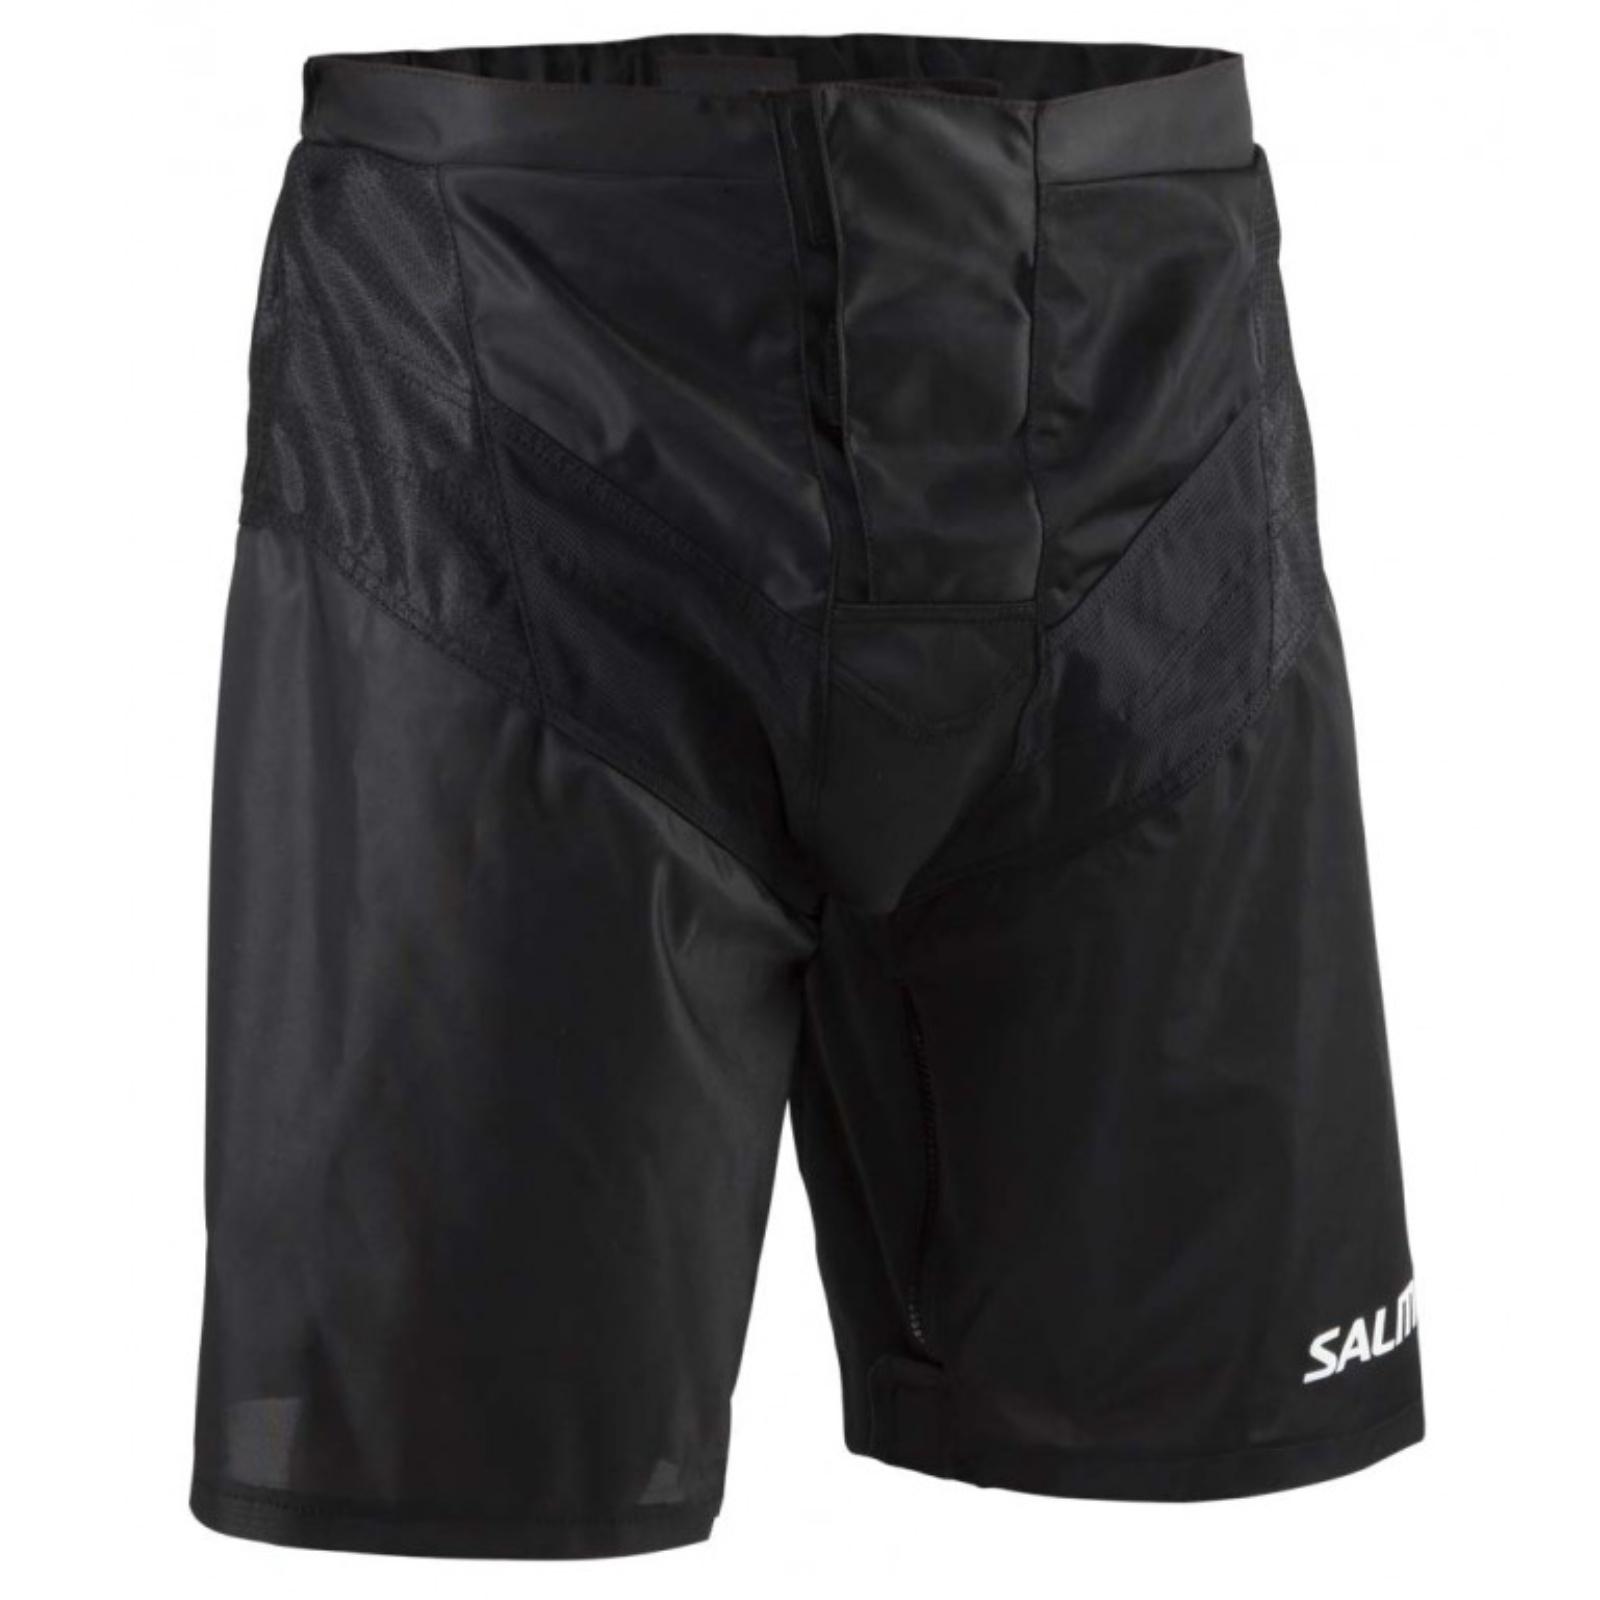 Hokejové kalhoty SALMING Girdle Pant - vel. L